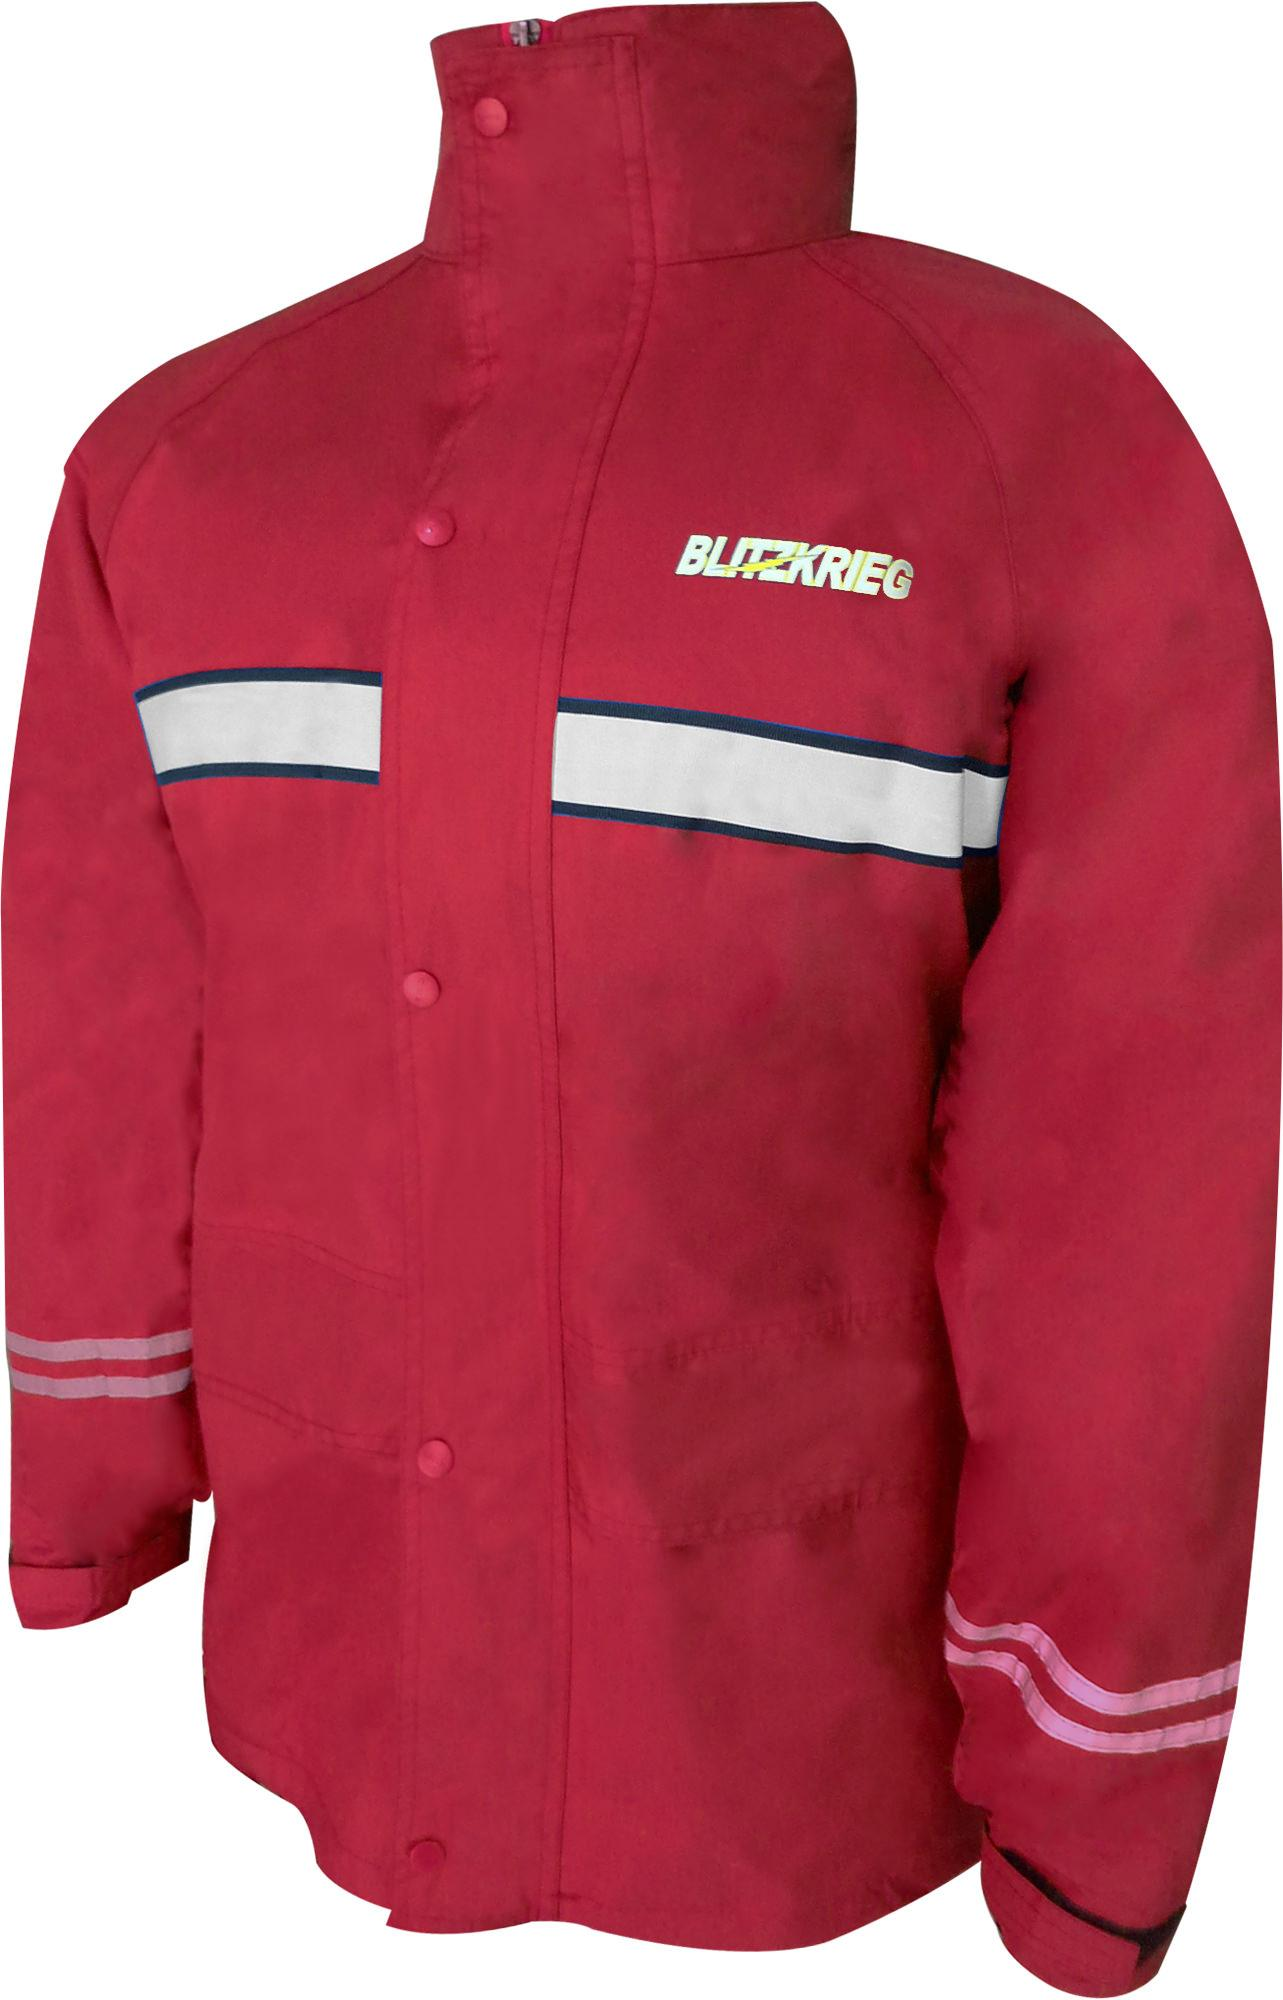 Blitzkrieg® MJ-Series MJ-07 Motorcycle Ultra Durable RainCoat & Jacket Set With